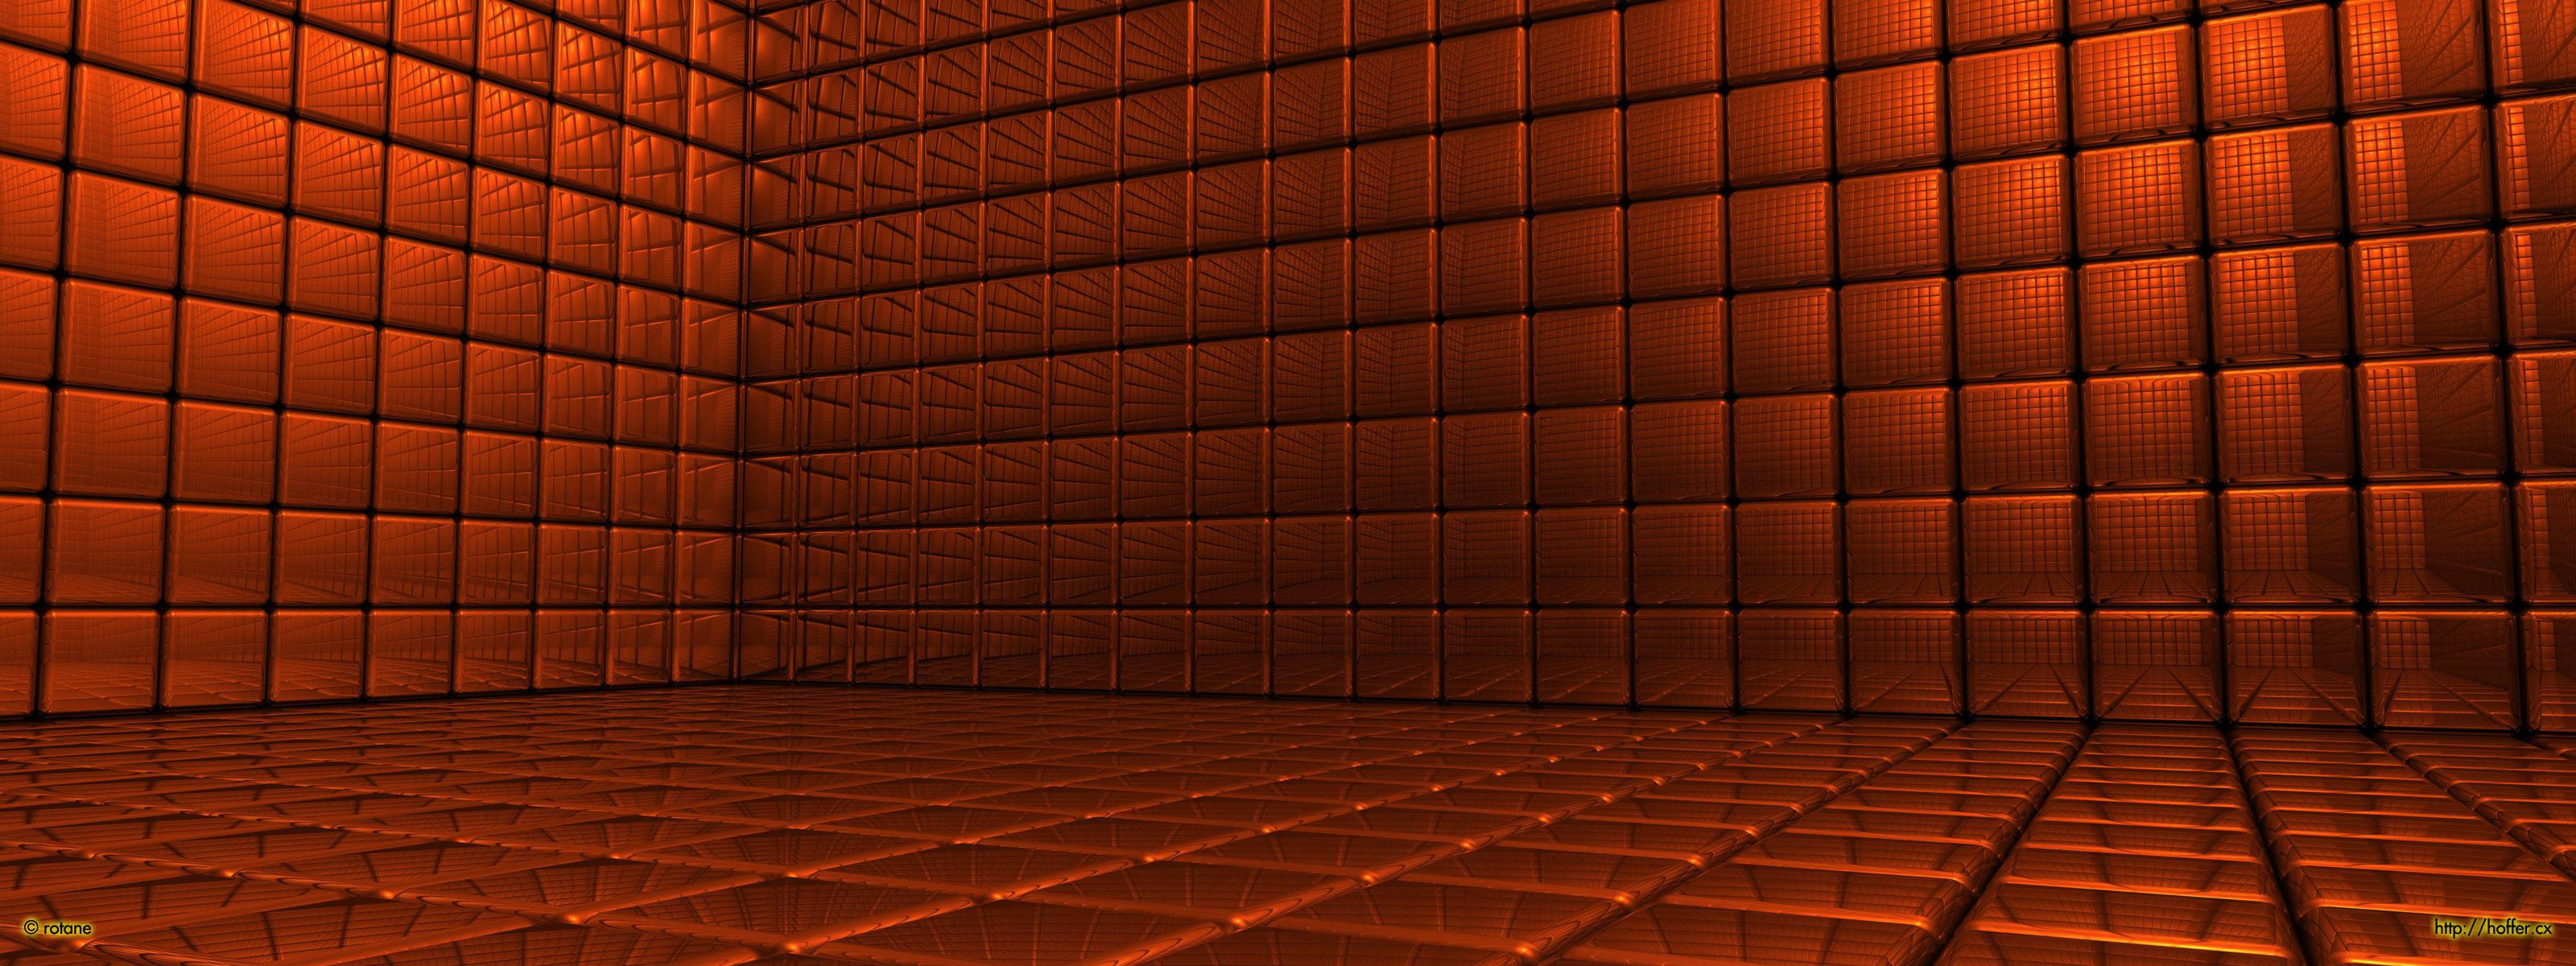 qubiq room 5 by rotane